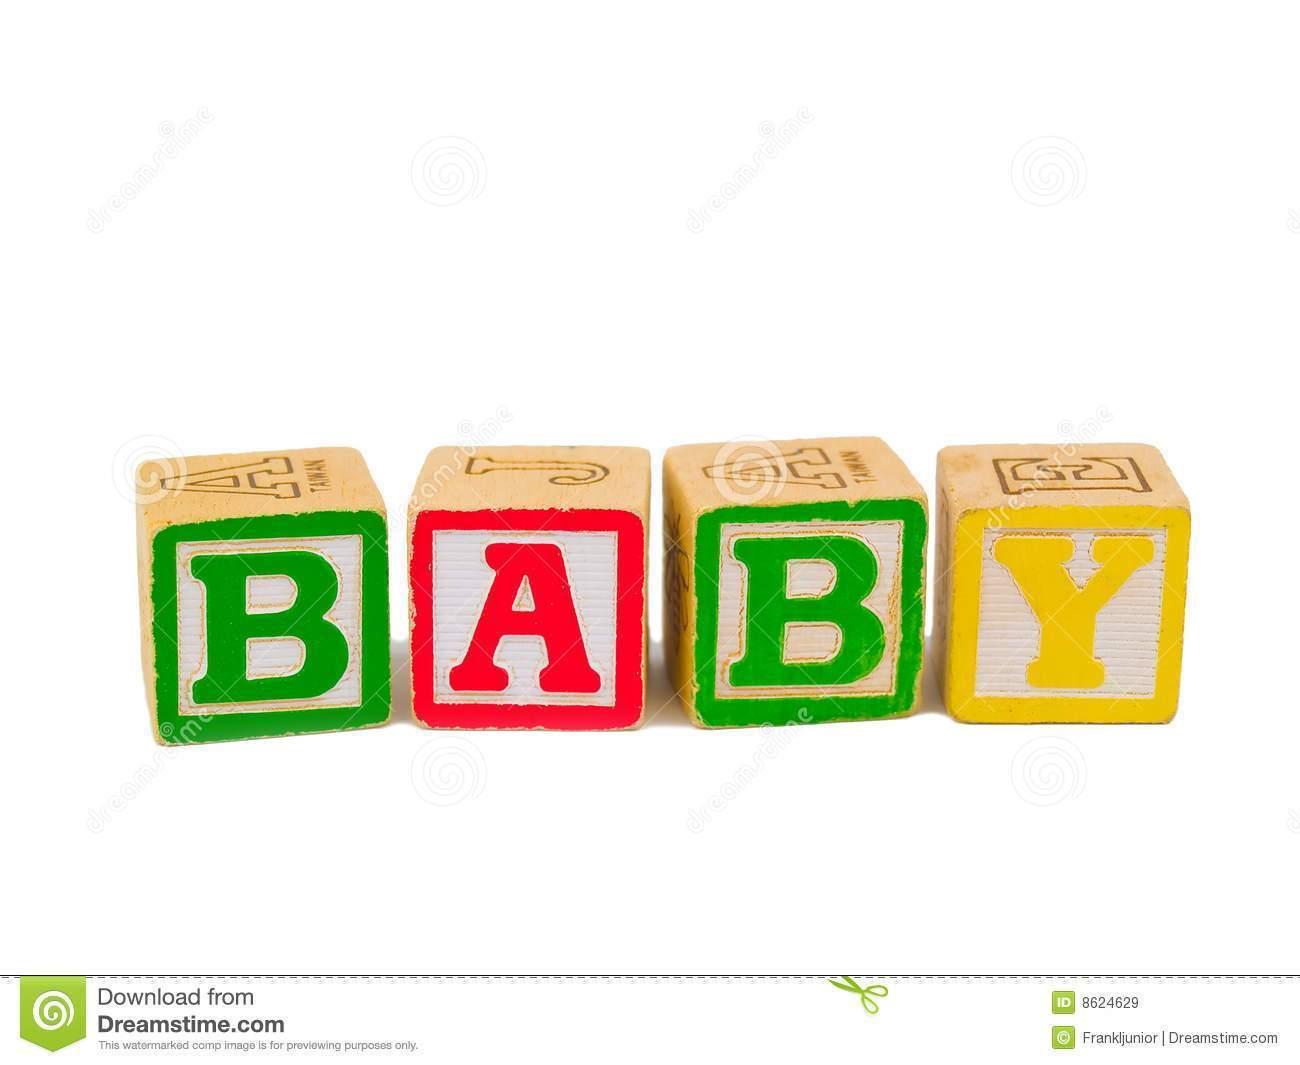 Baby Abc Blocks Clipart Suggest.